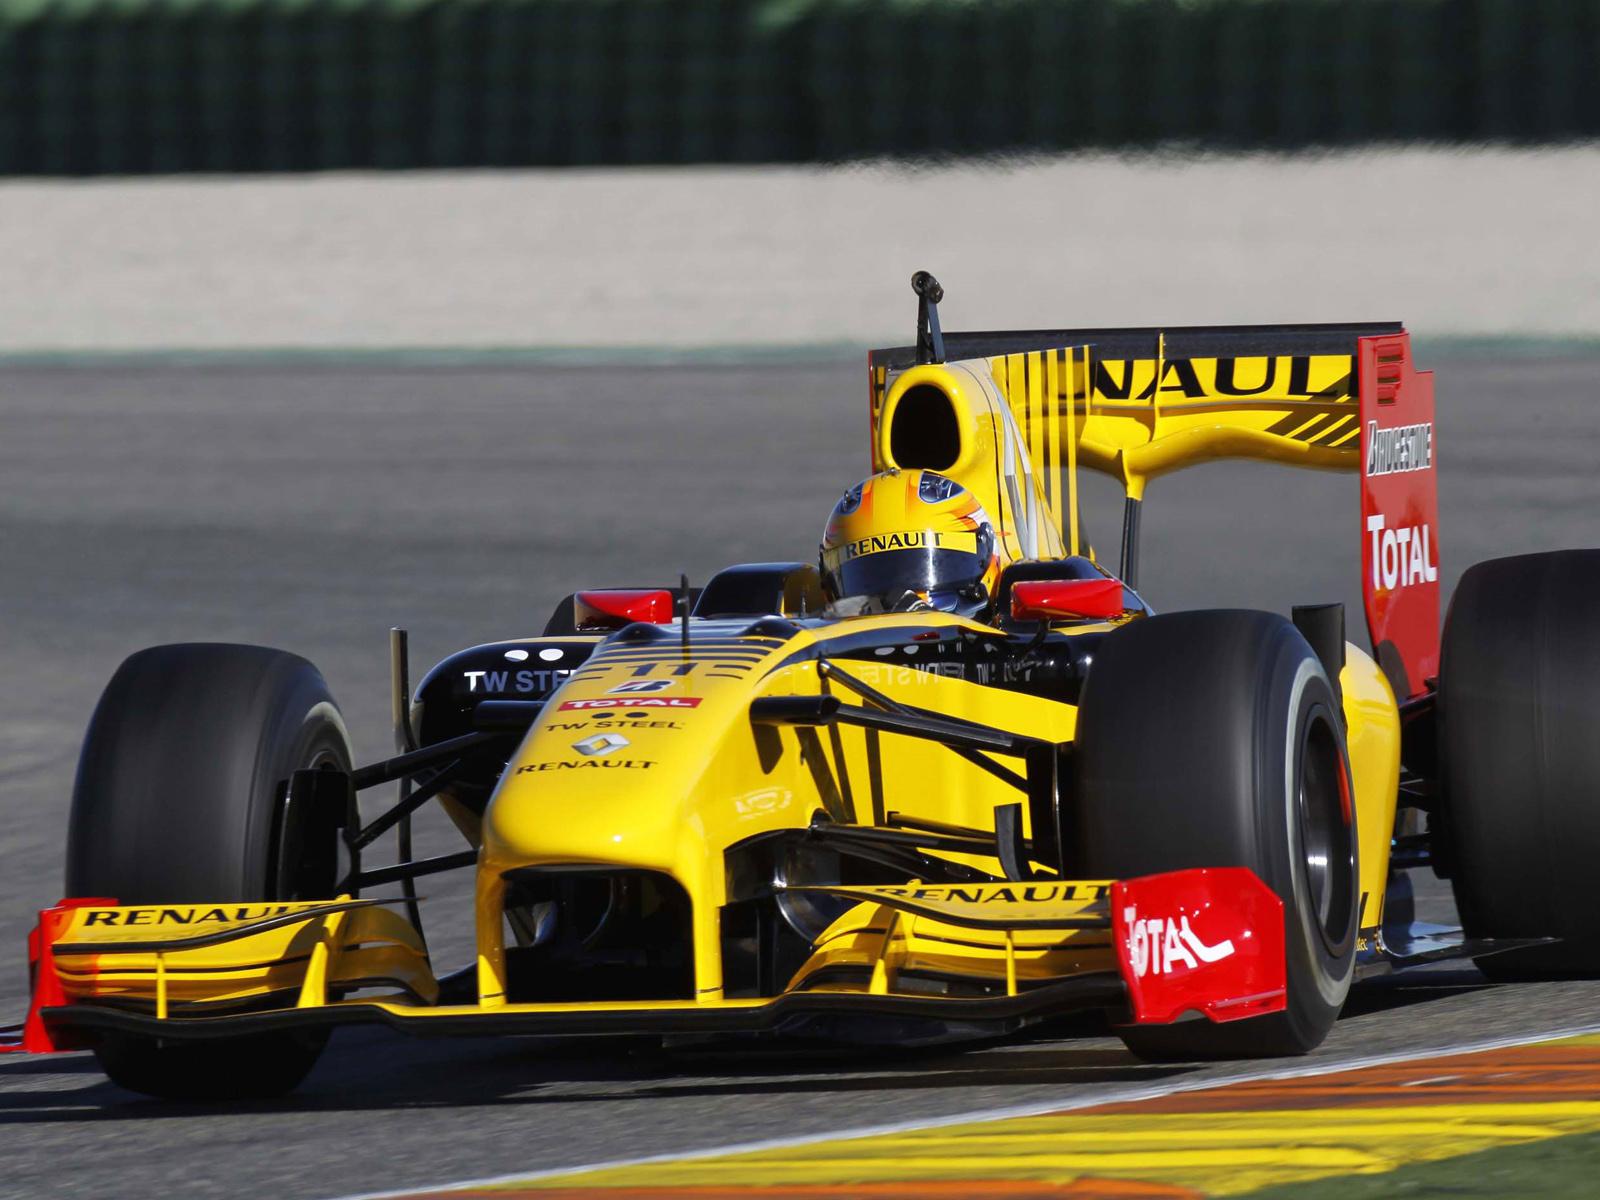 renault formula 1 wallpaper - photo #13